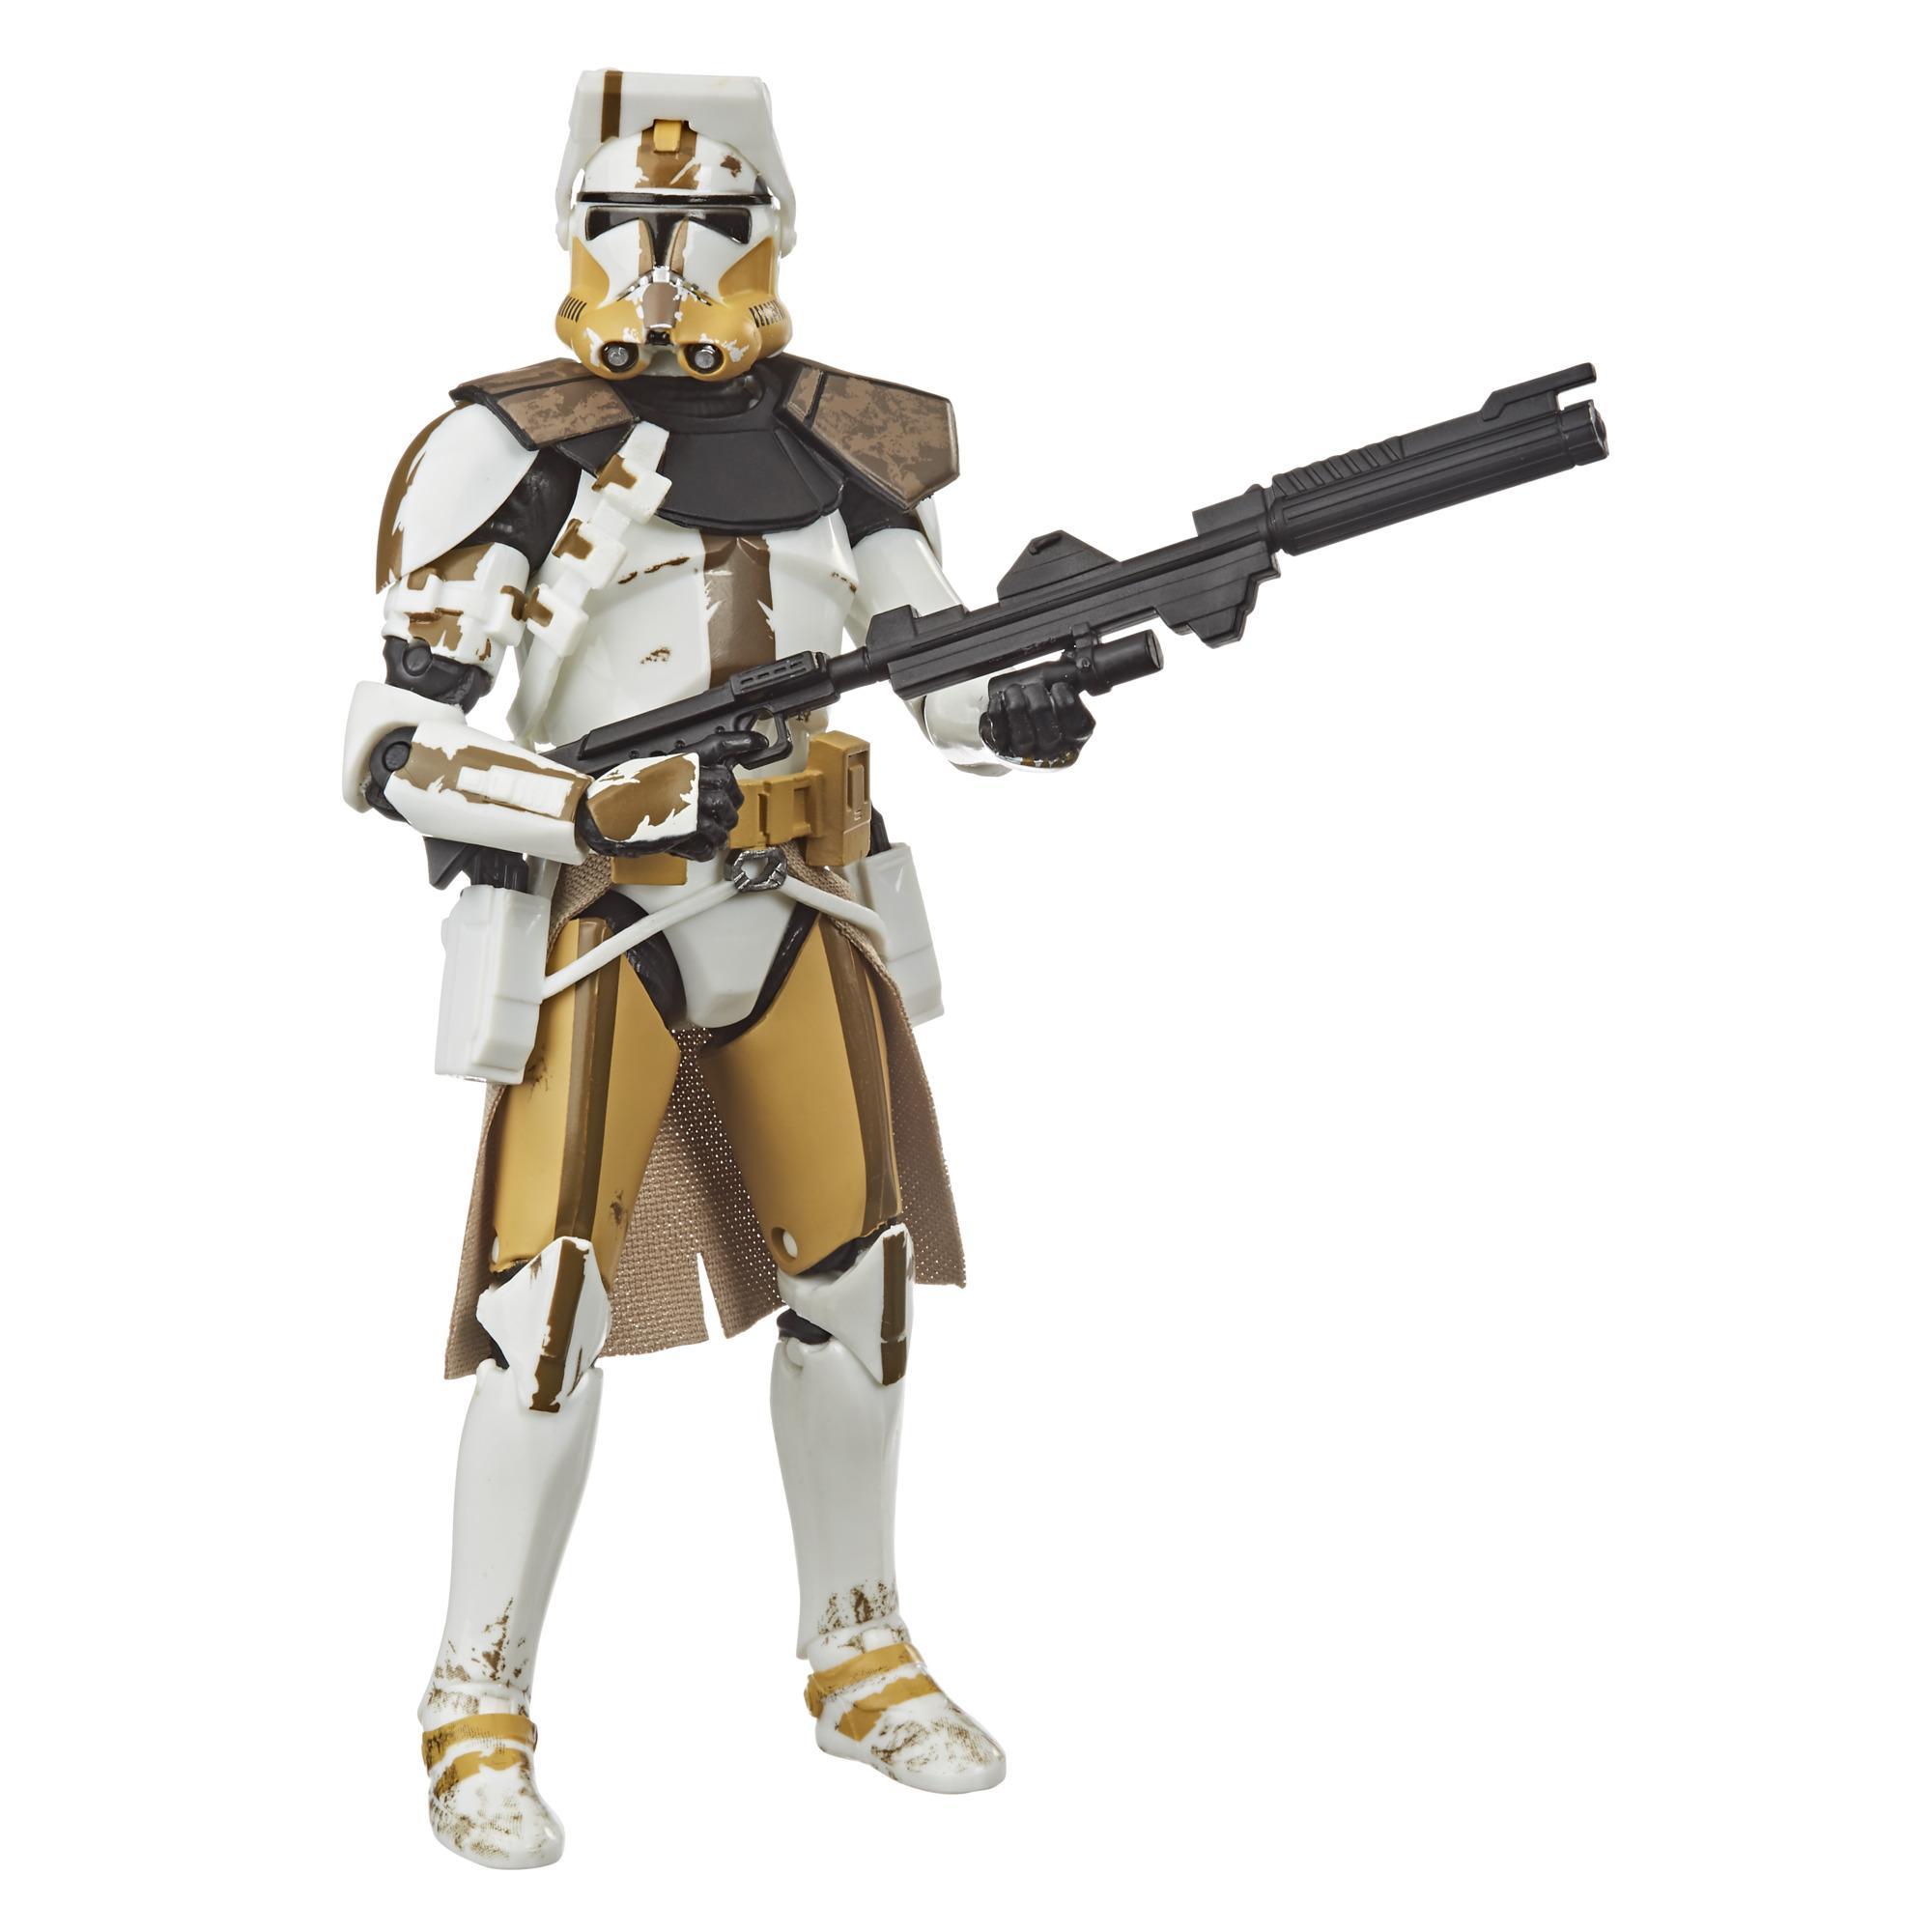 Klonkommandør Bly-legetøj fra Star Wars The Black Series, Star Wars: The Clone Wars-actionsamlerfigur på 15cm